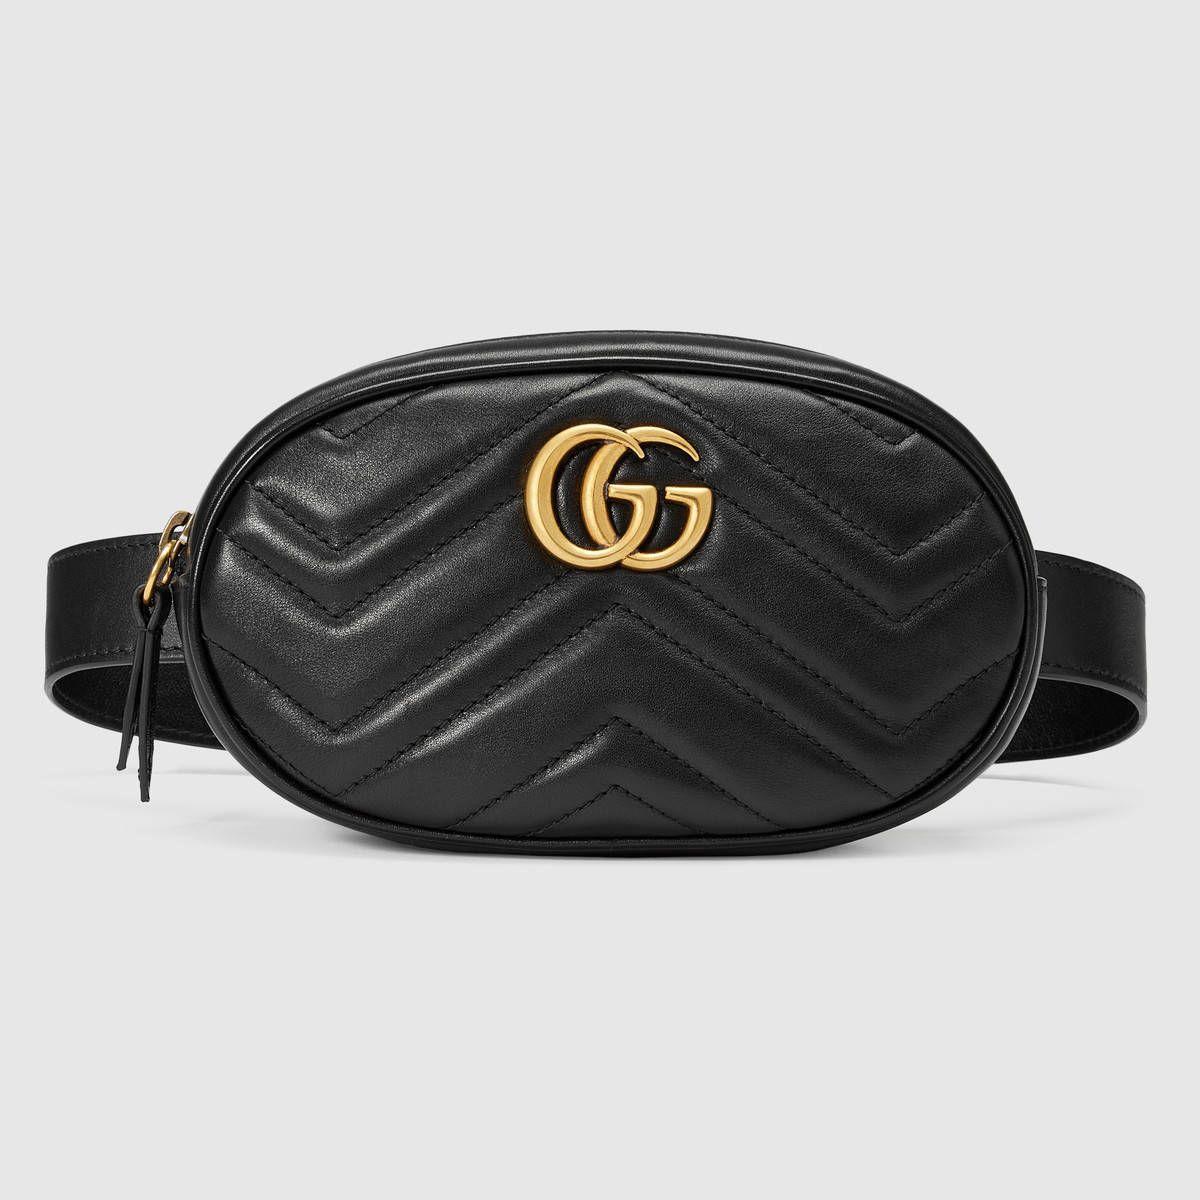 8bd3f478a GG Marmont matelassé leather belt bag - Gucci Belt Bags 476434DSVRT1000